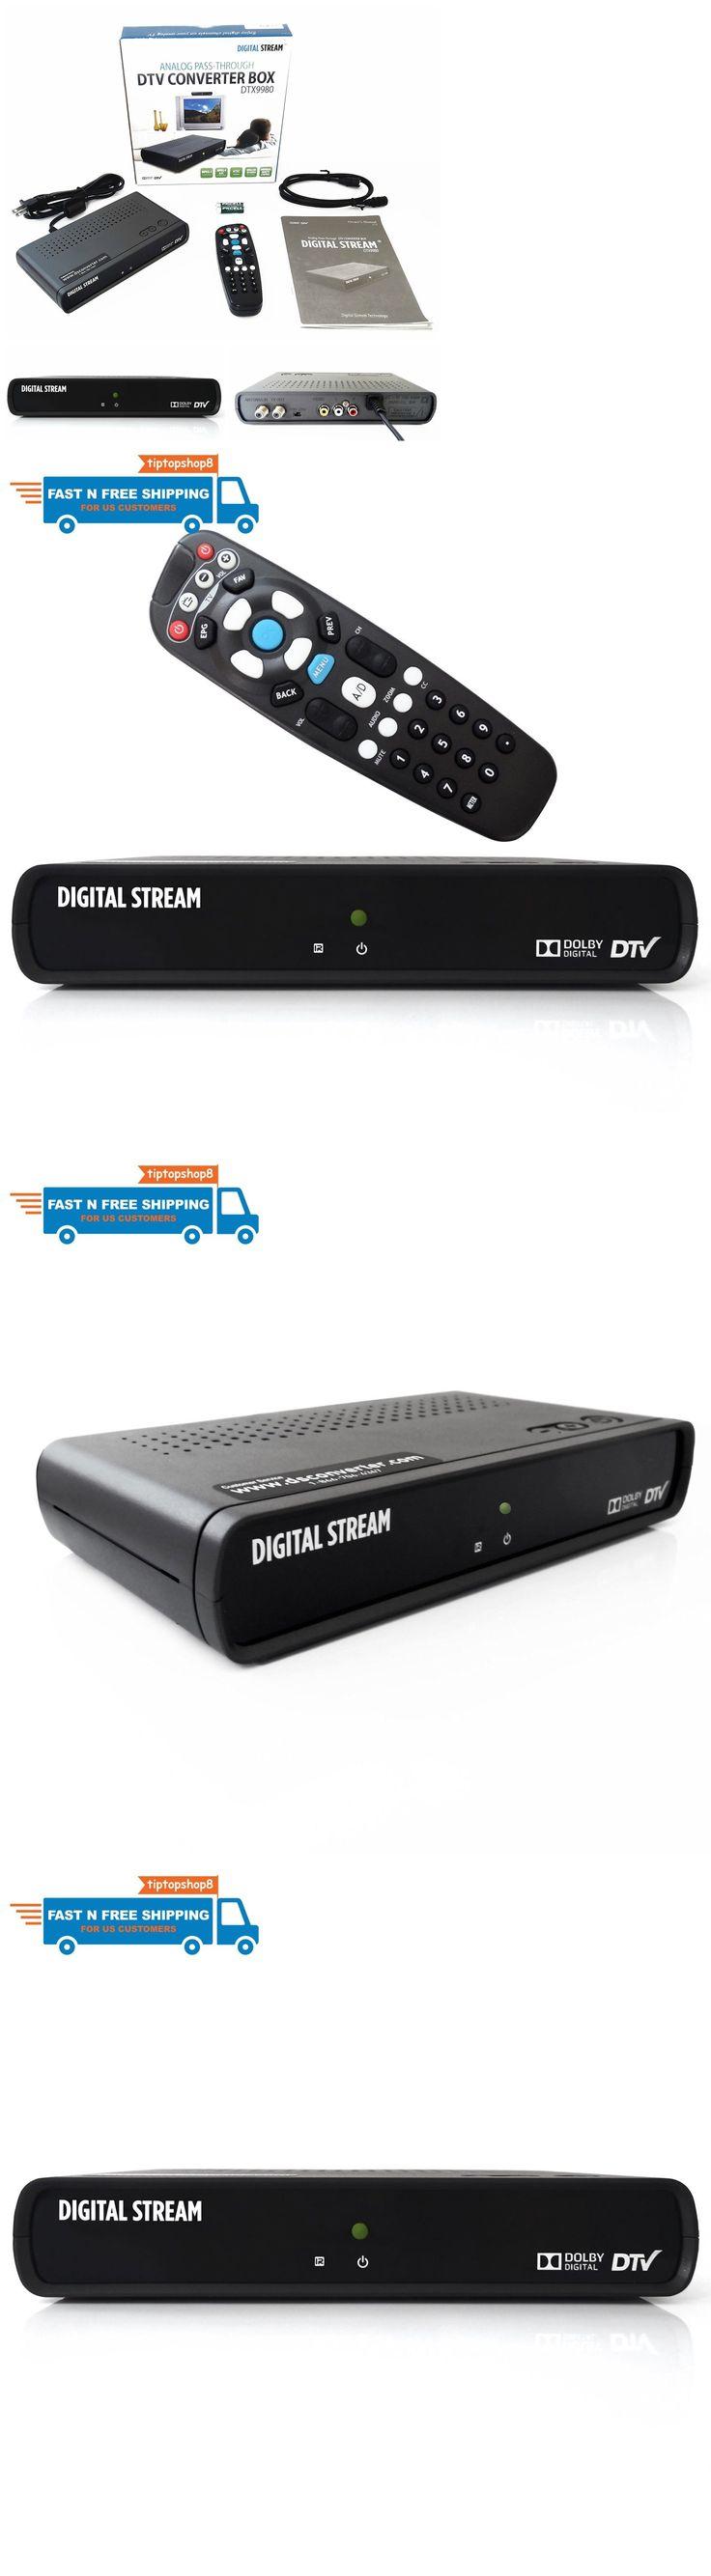 Cable TV Boxes: New Digital Tv Converter Box Homeworx Hd Dvr Media Player Recorder Atsc Hdmi Pvr -> BUY IT NOW ONLY: $37.97 on eBay!